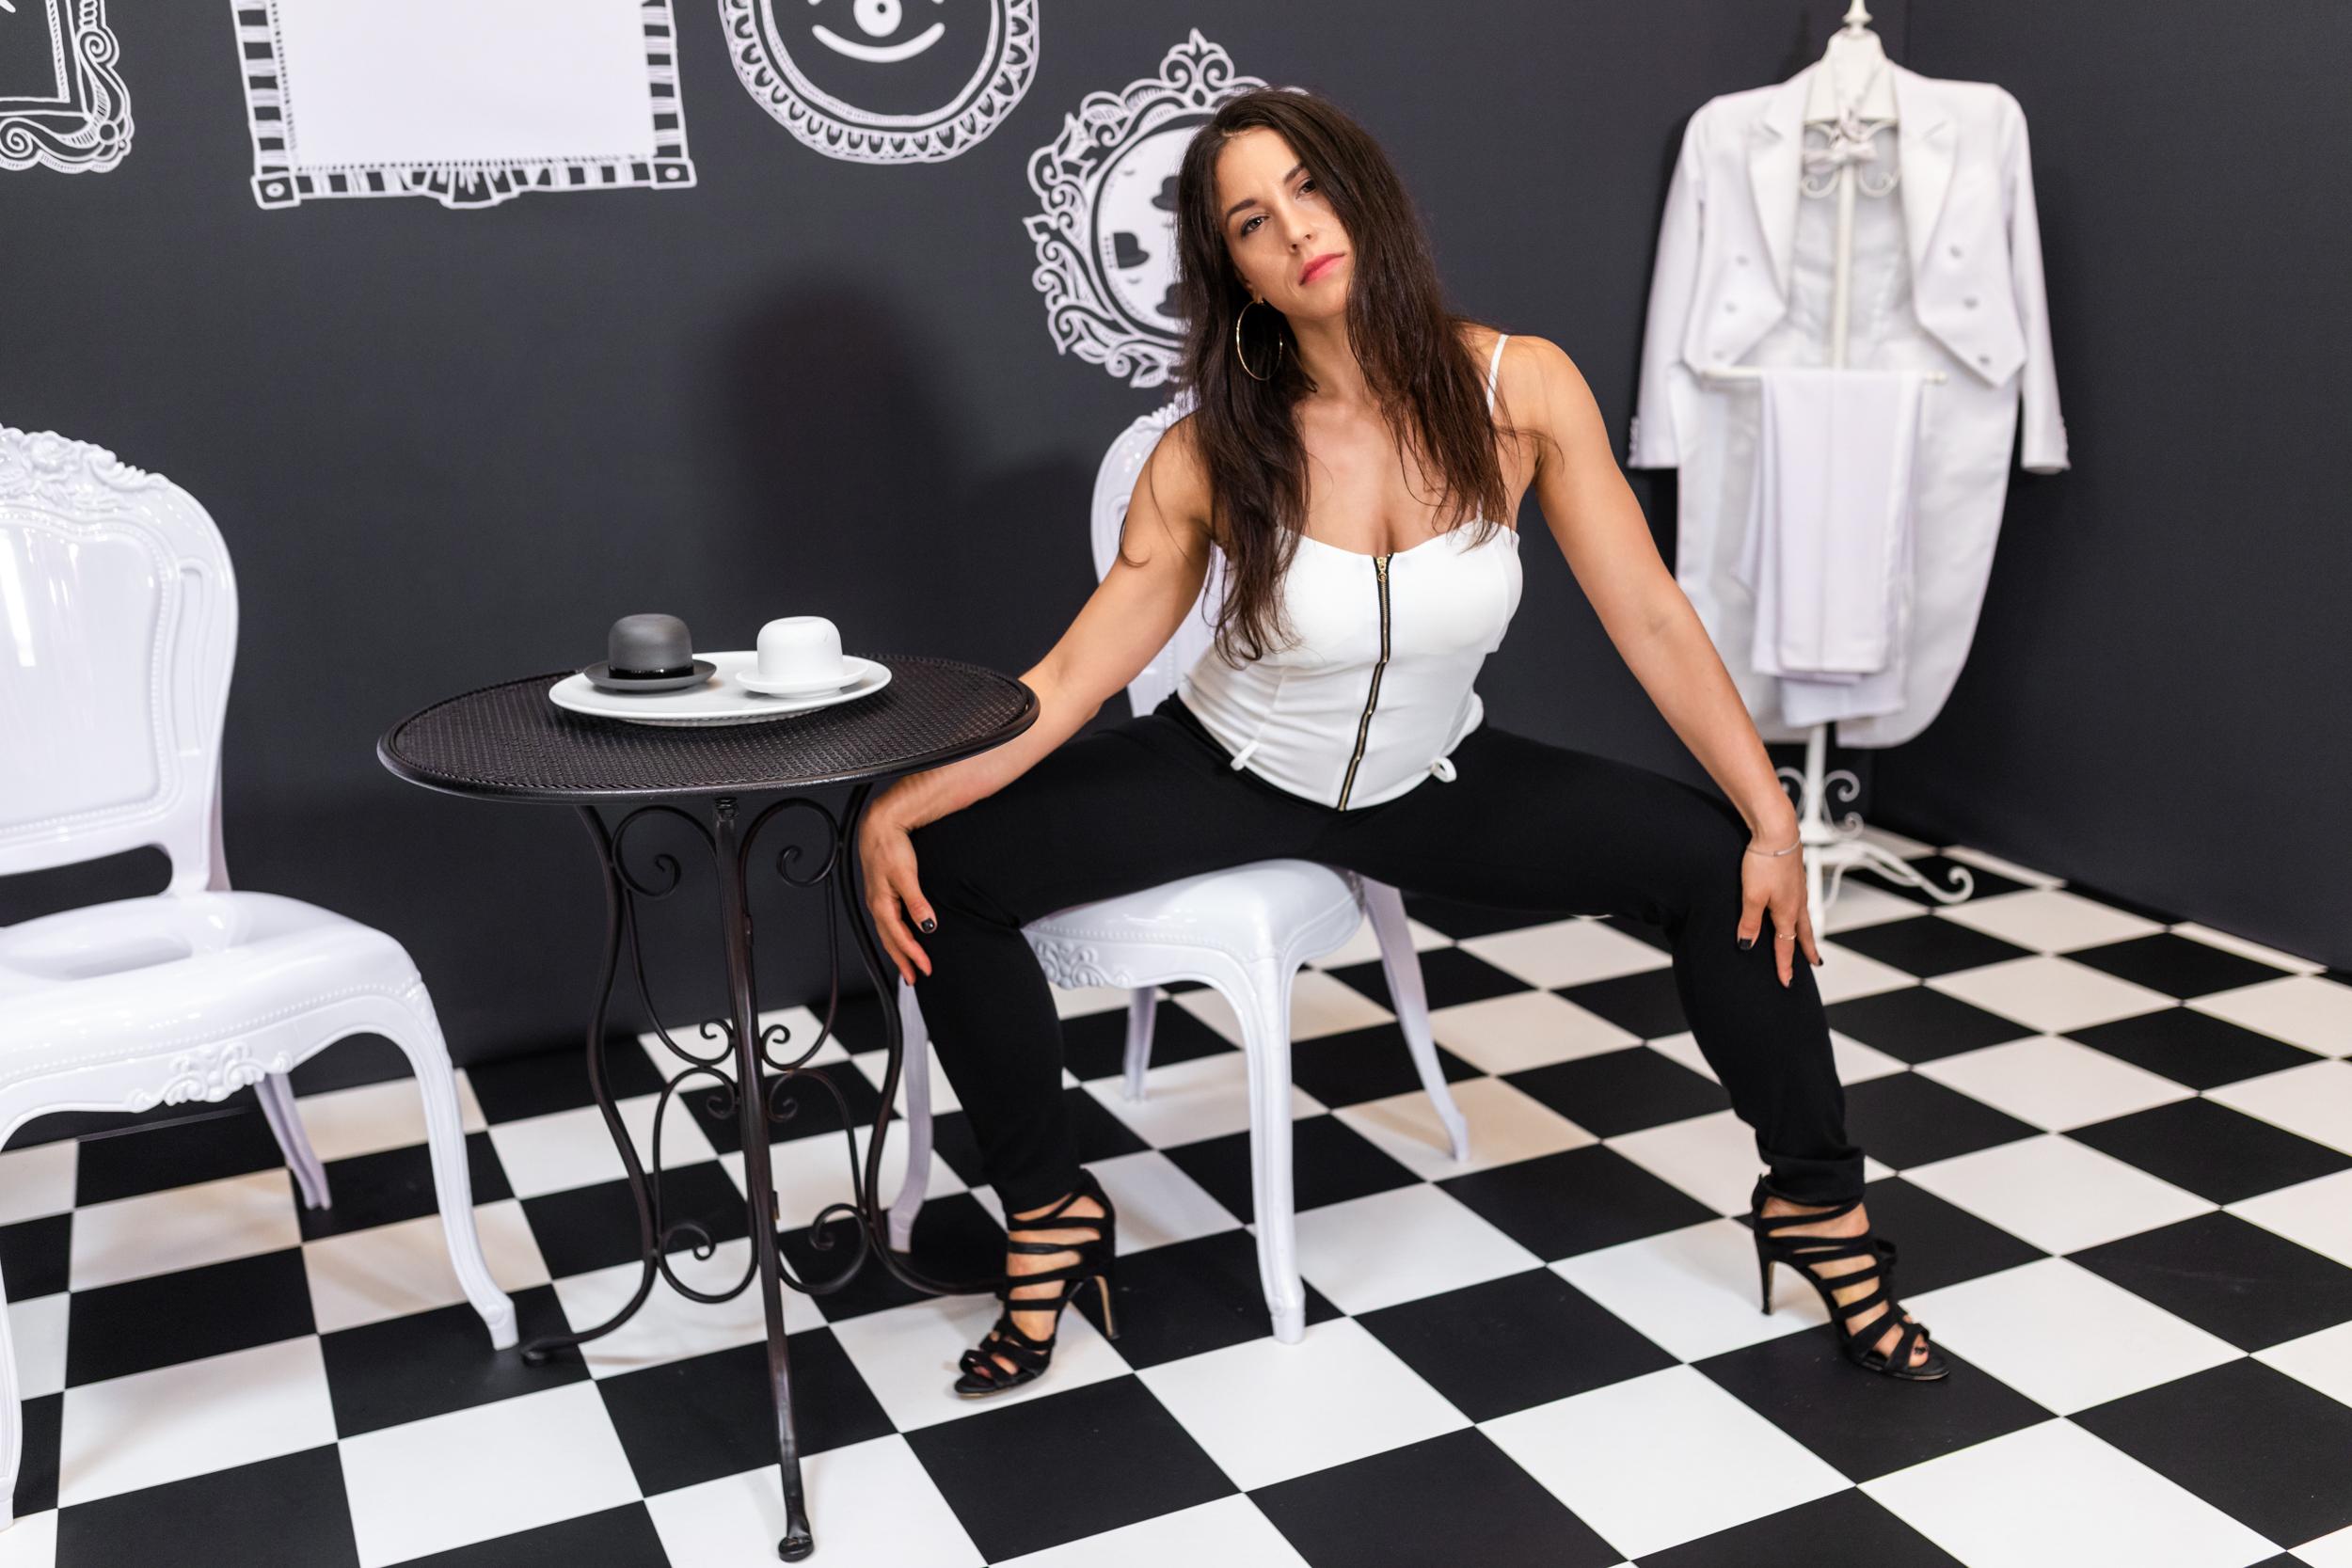 Black White Portfolio Konzept Art 3  Tee Zeit - Fotografie Konzept